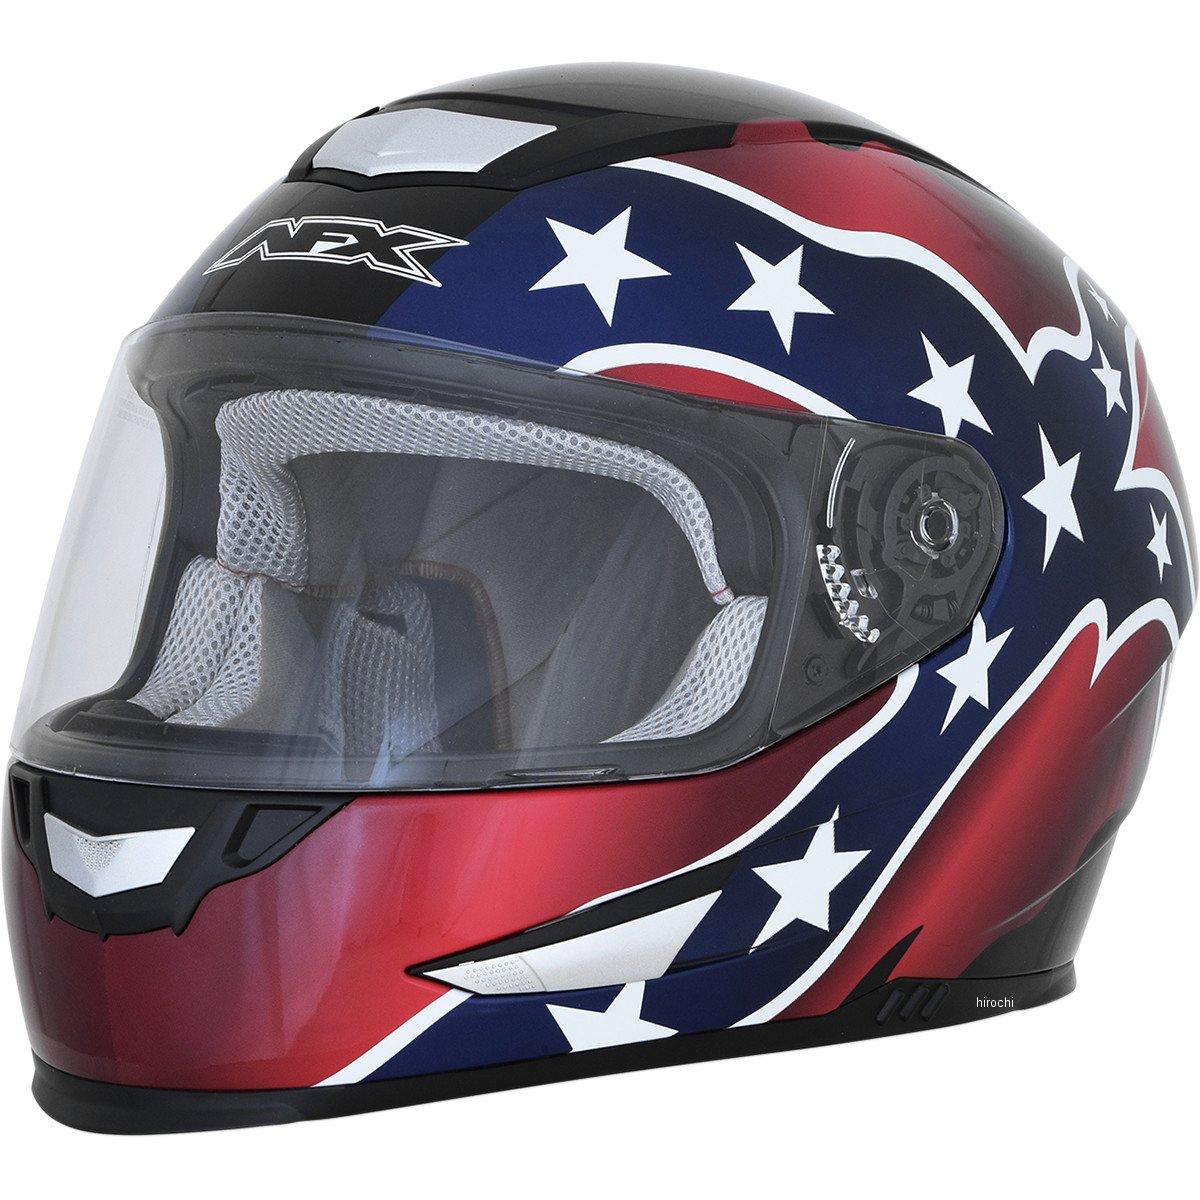 【USA在庫あり】 AFX フルフェイスヘルメット FX-99 黒レベル(つや有り) Sサイズ (56cm-57cm) 0101-11371 JP店